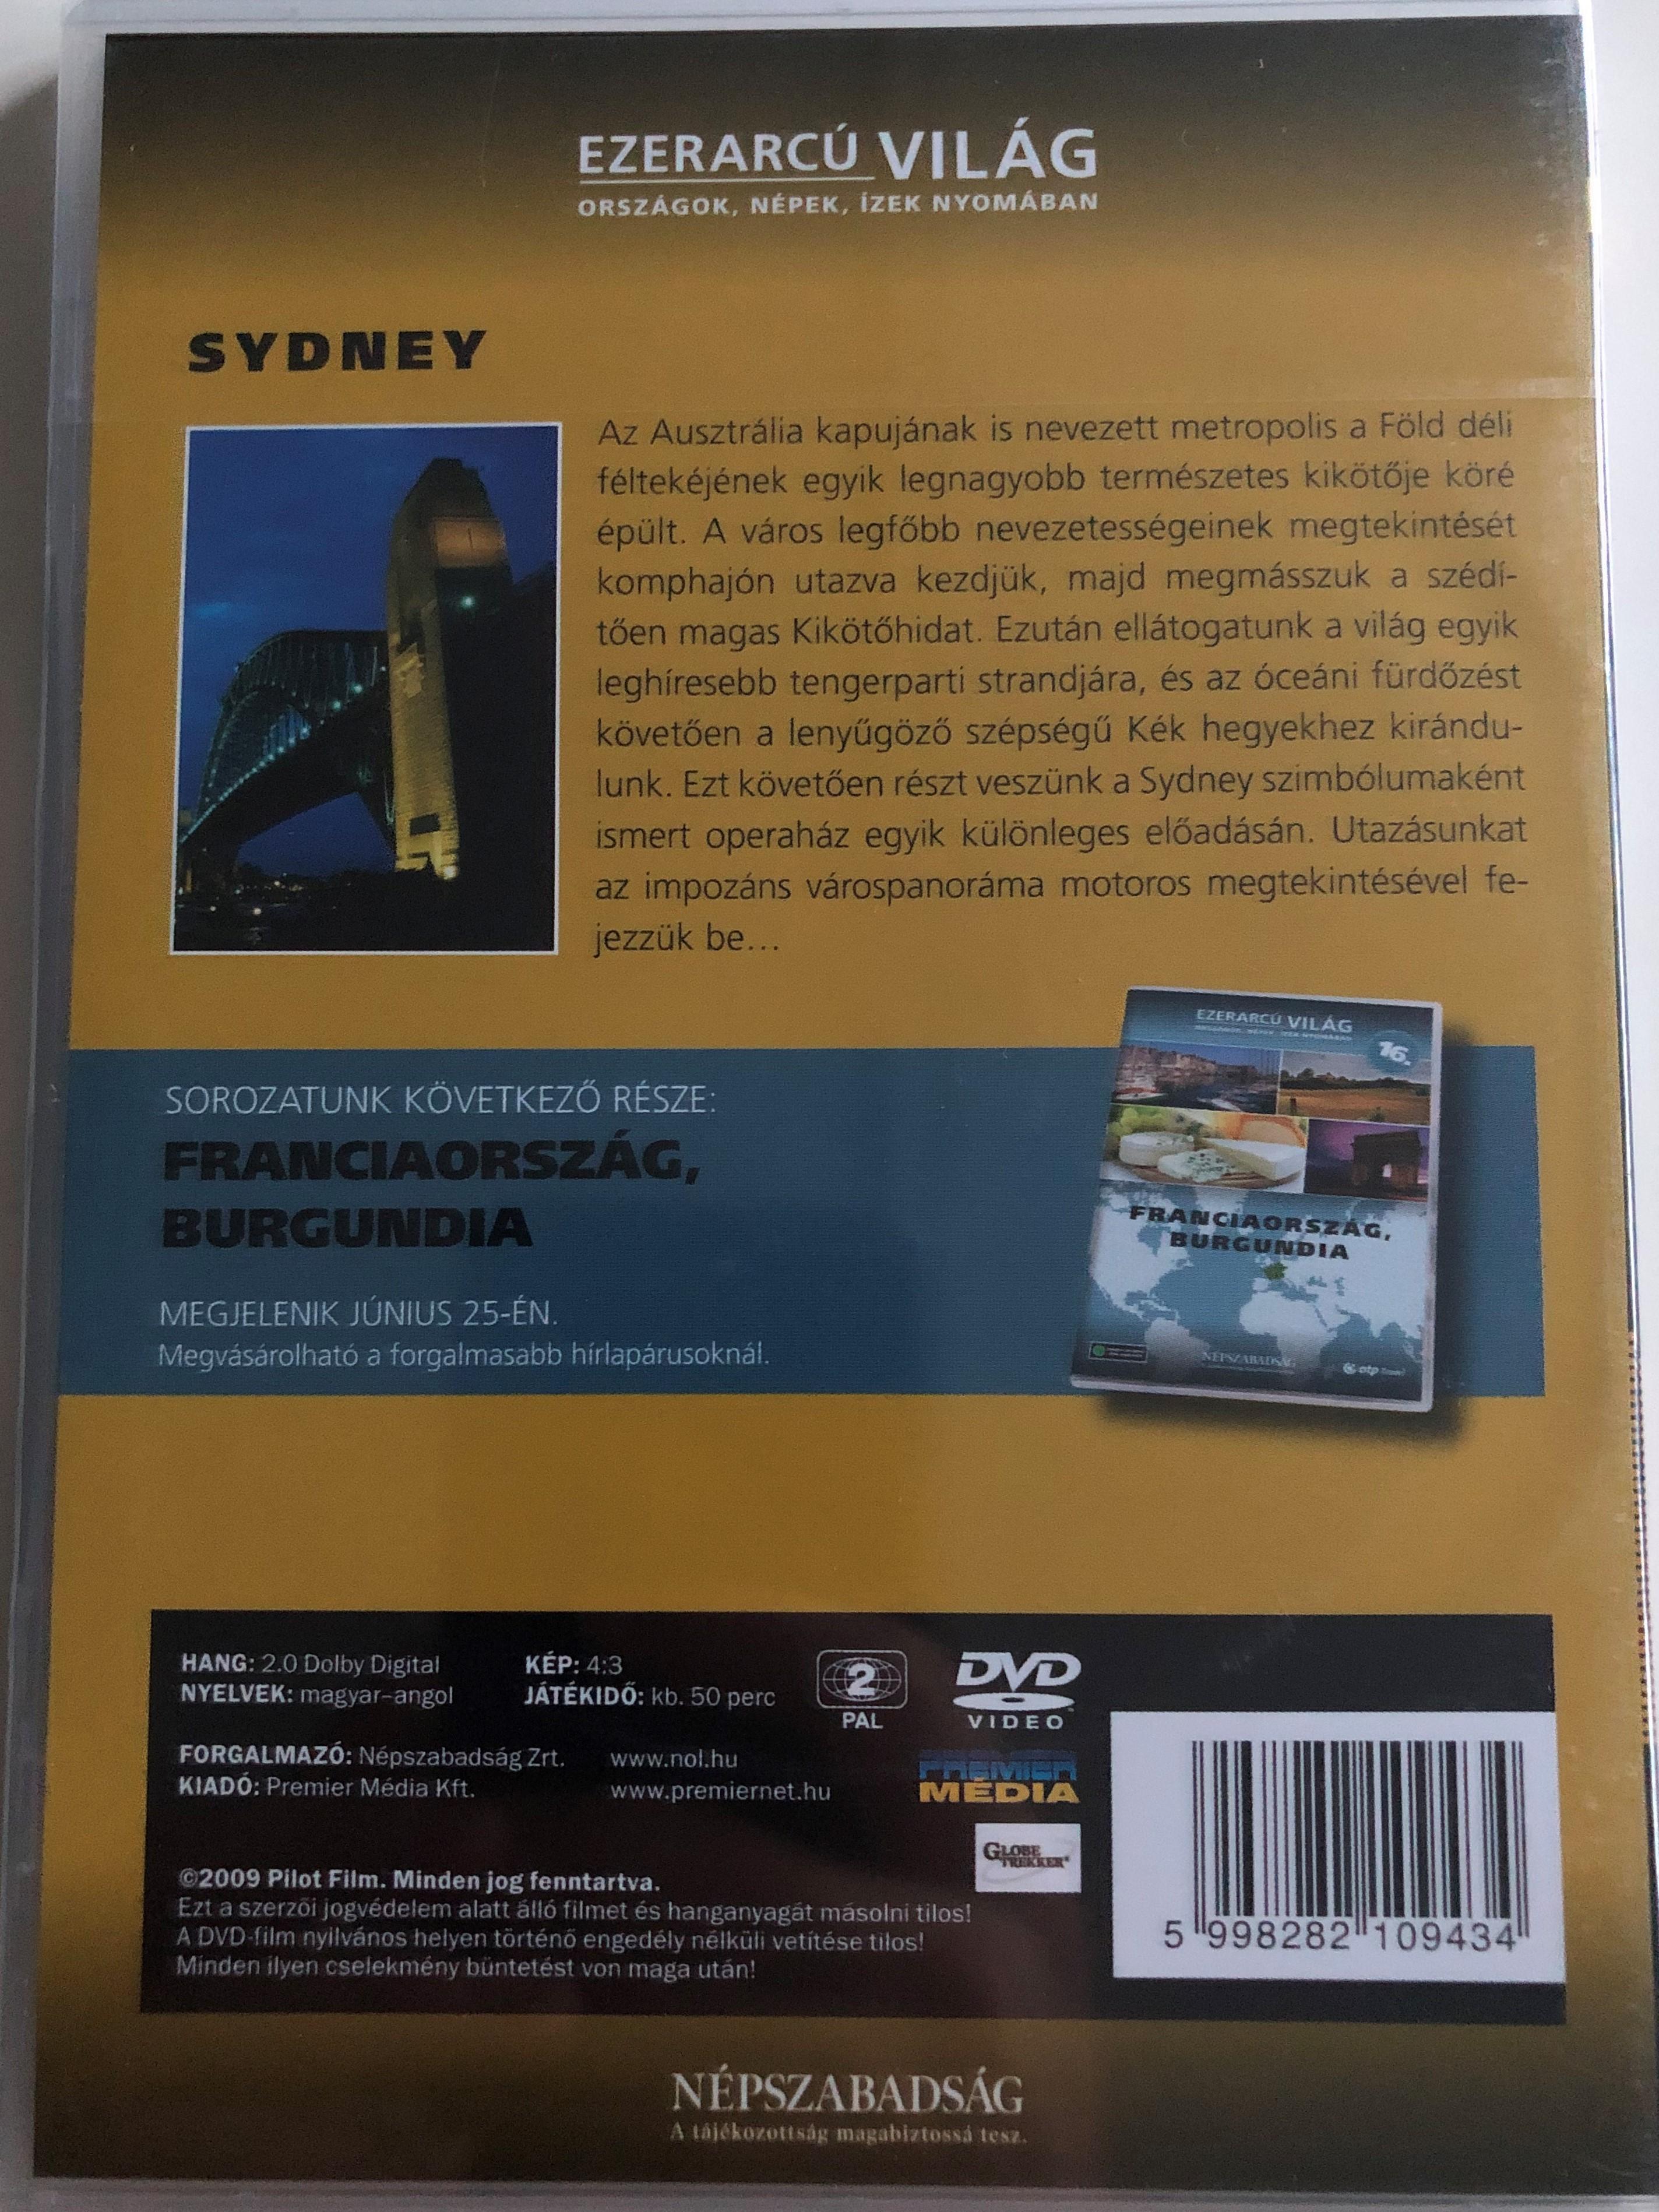 ezerarc-vil-g-vol.-15-sydney-dvd-2009-orsz-gok-n-pek-zek-nyom-ban-20-x-dvd-set-2009-n-pszabads-g-premier-media-pilot-film-documentary-series-about-our-world-2-.jpg